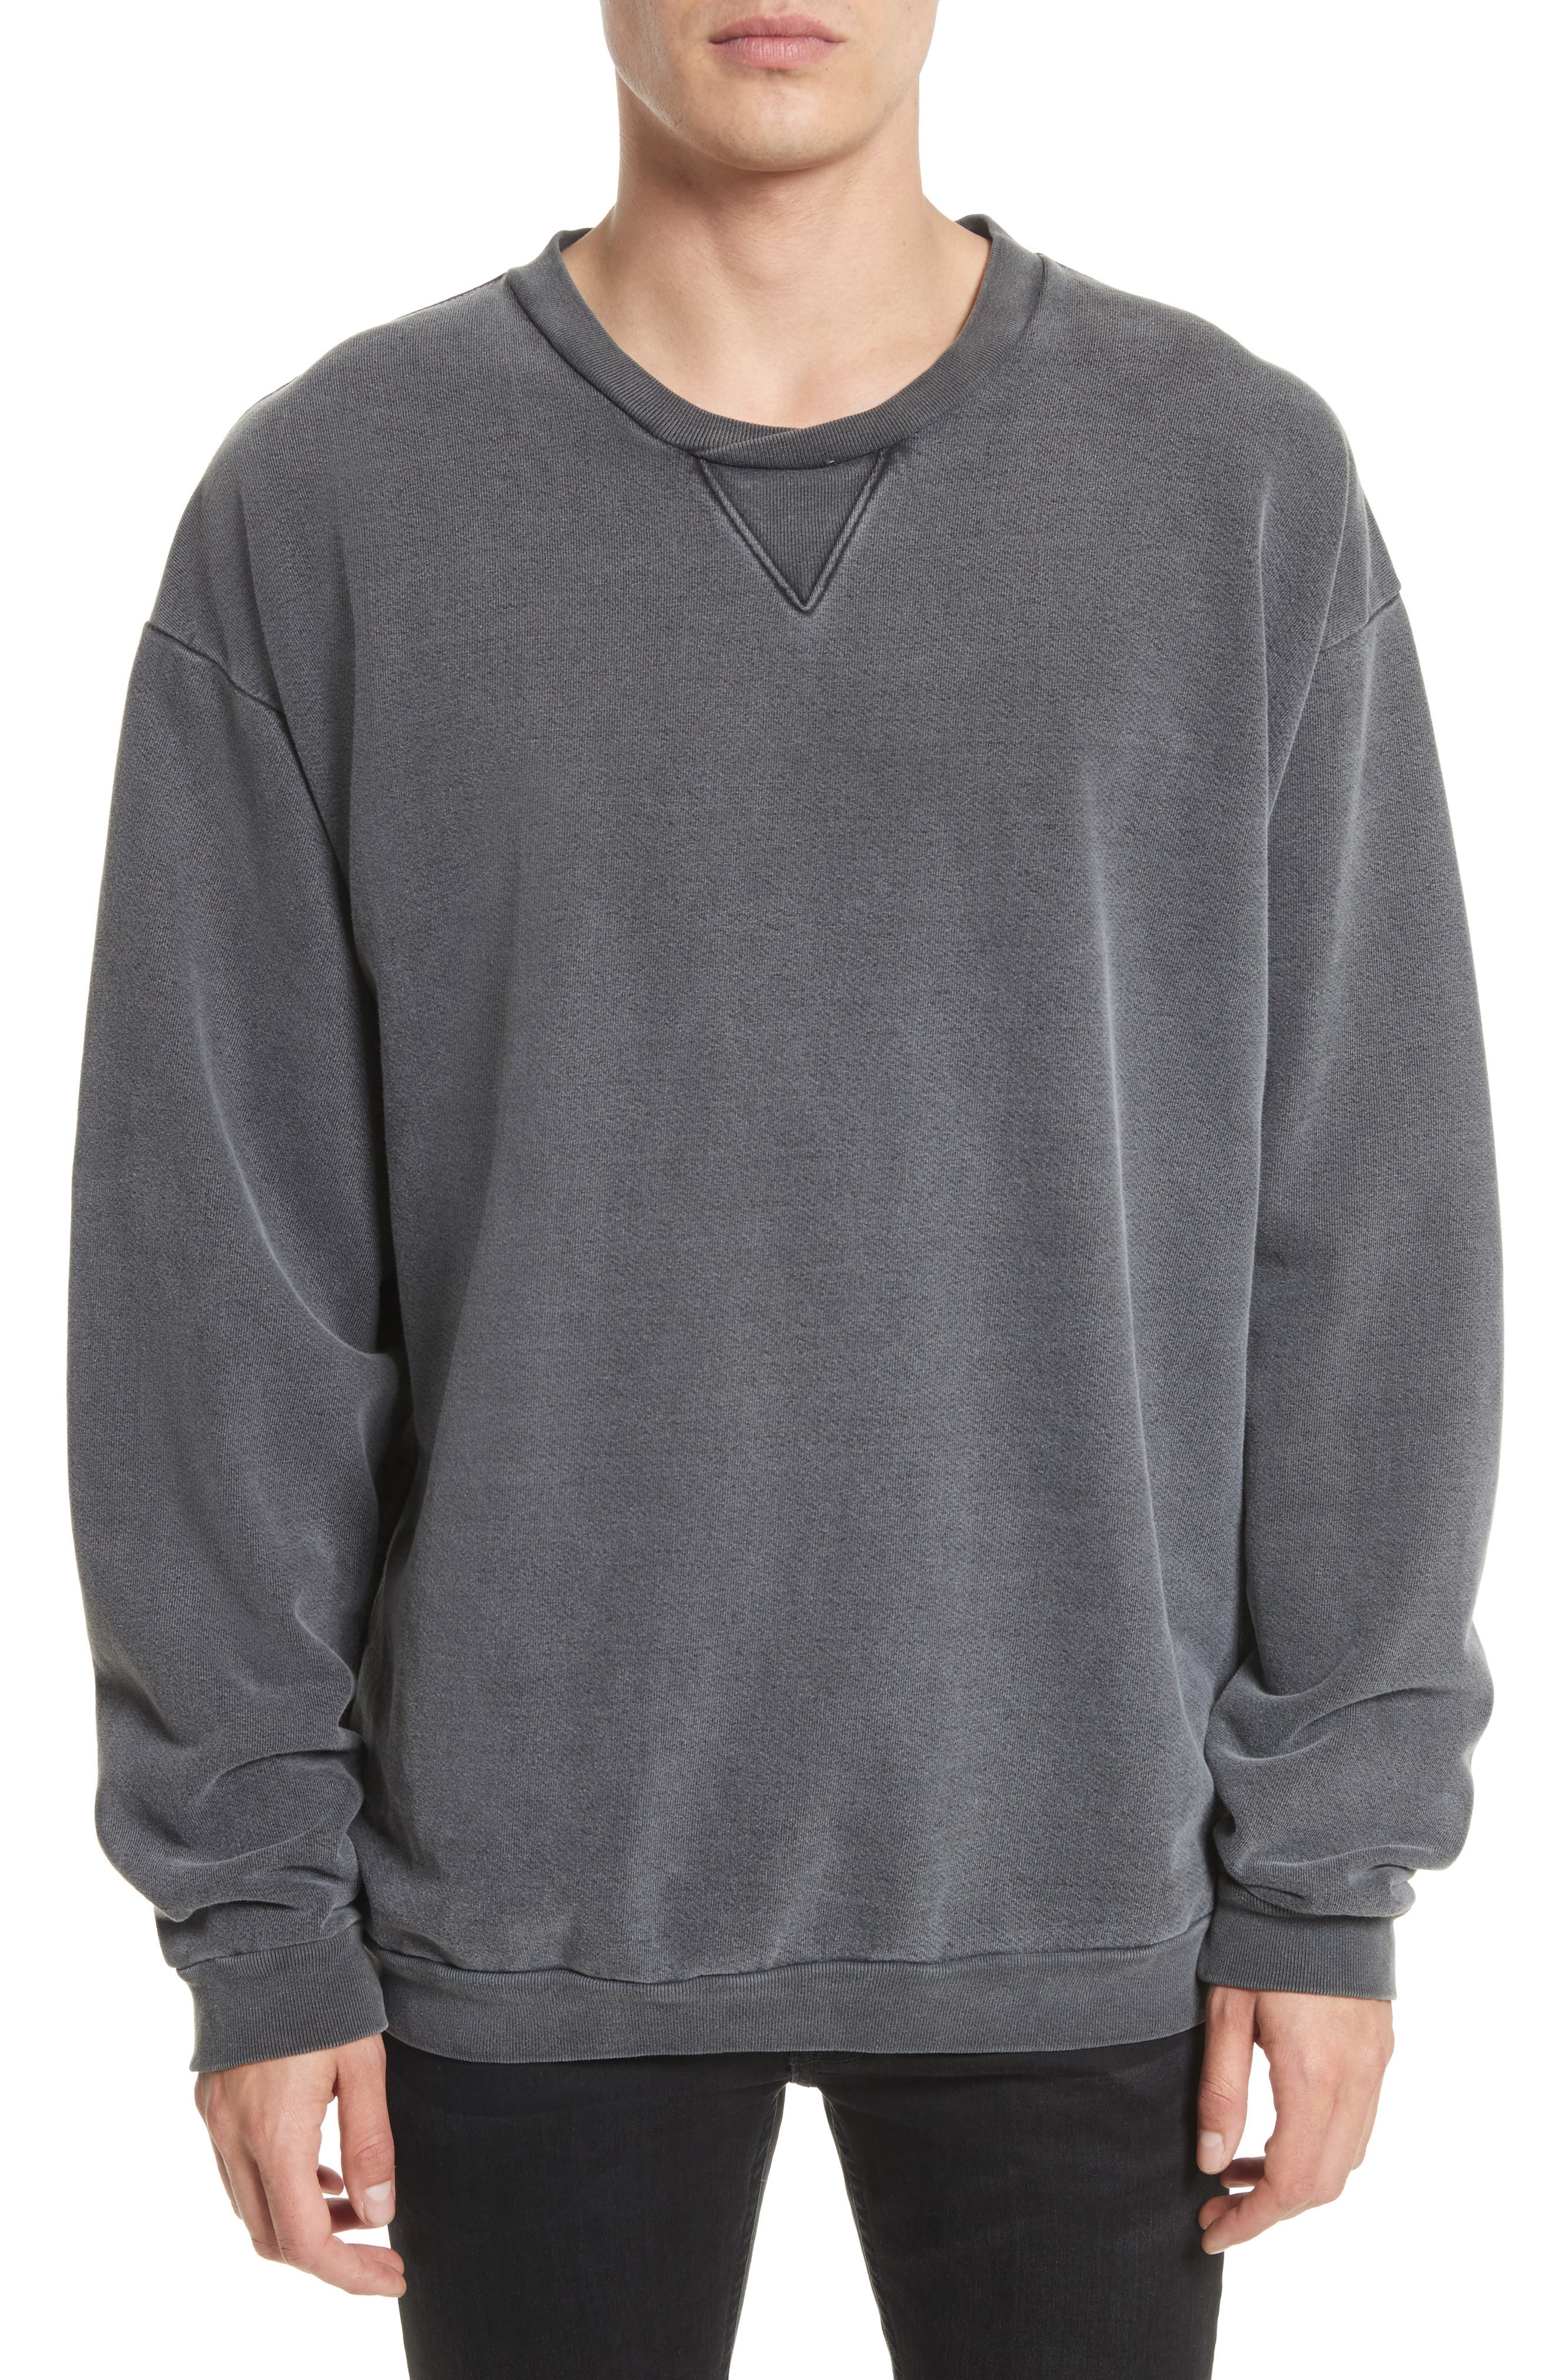 Drifter Norton Sweatshirt